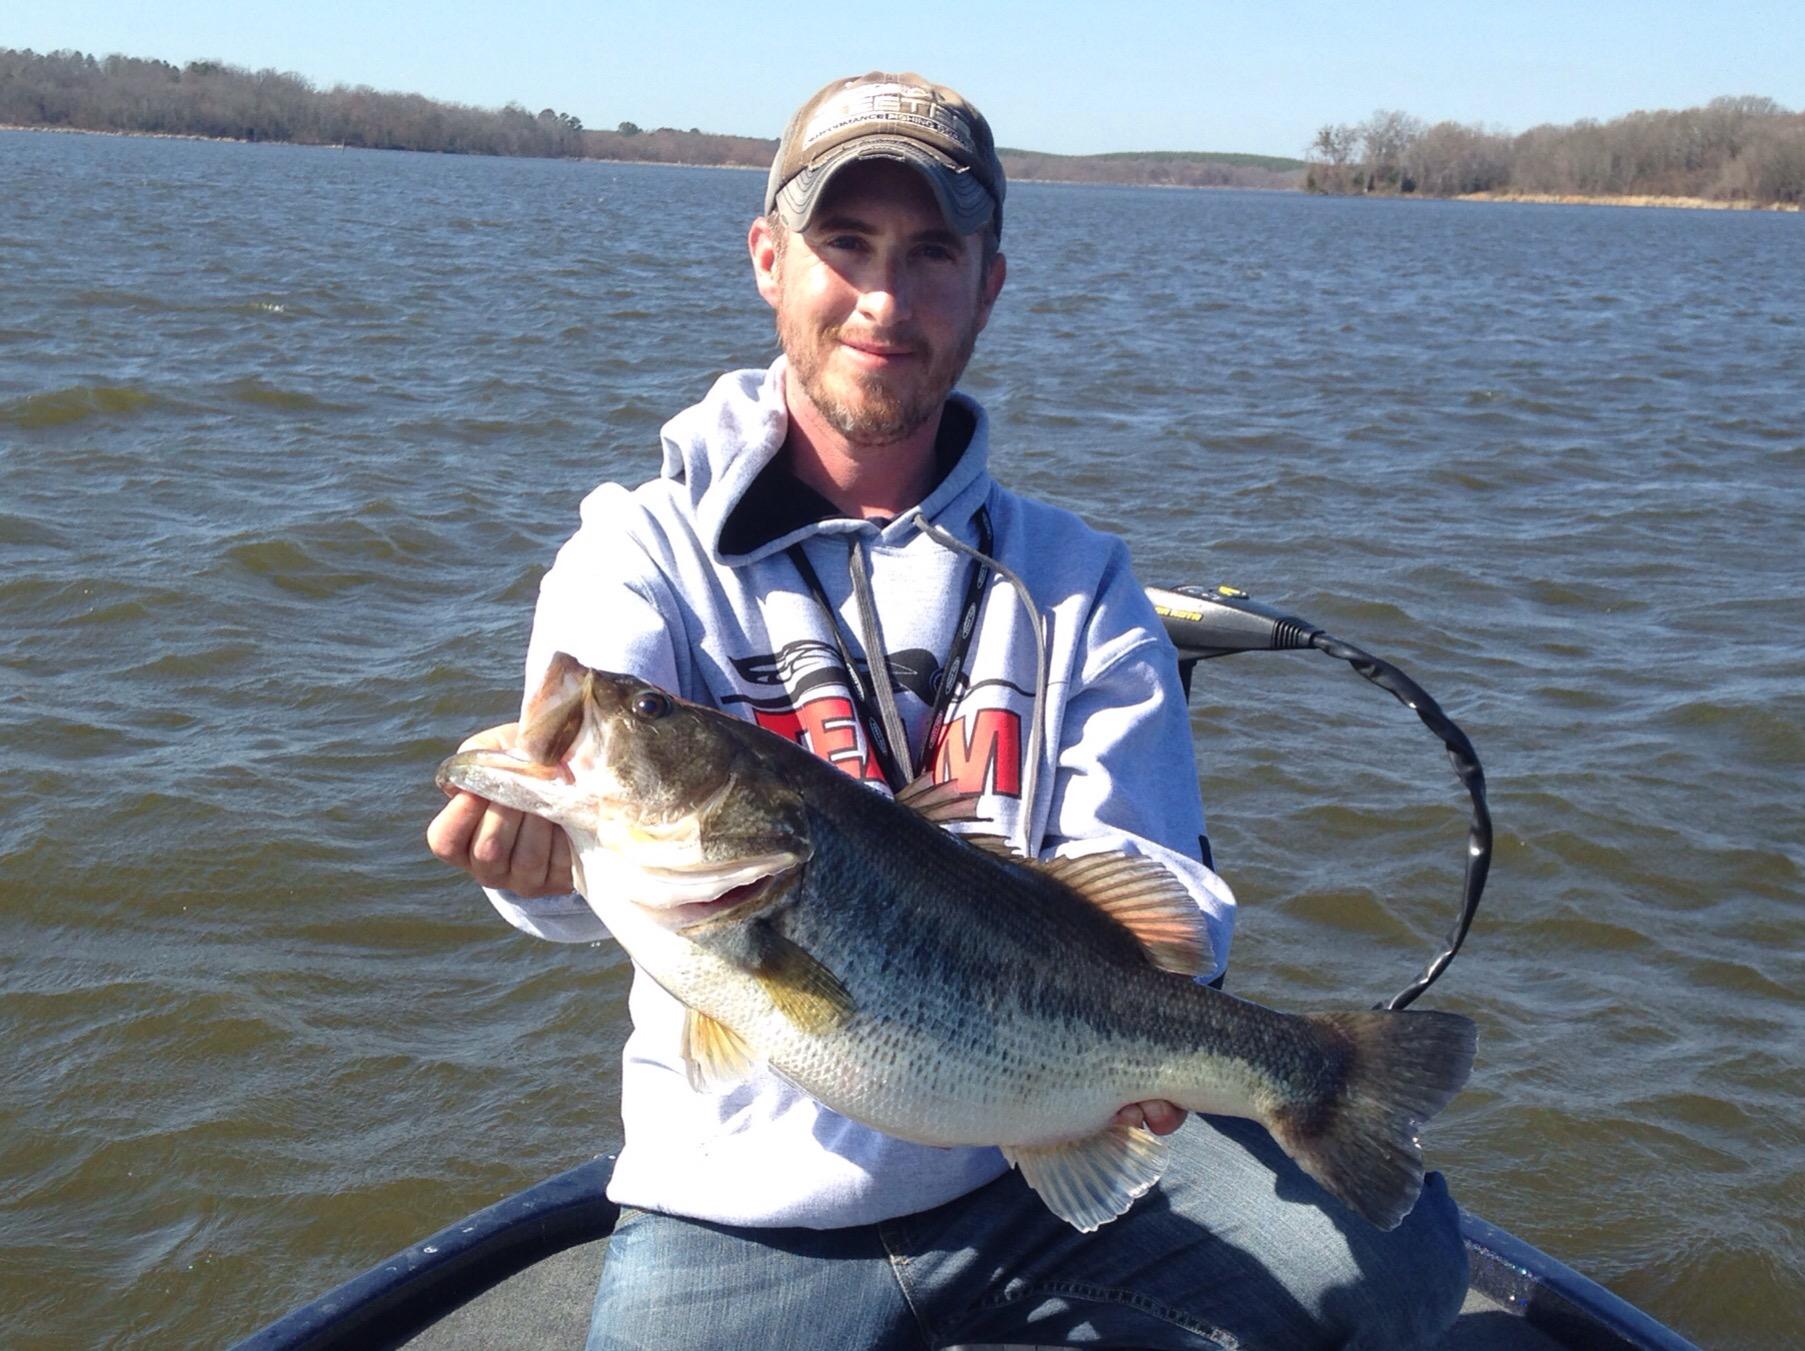 Big bass showing up lake fork lake fork guide andrew grills for Fishing lake fork